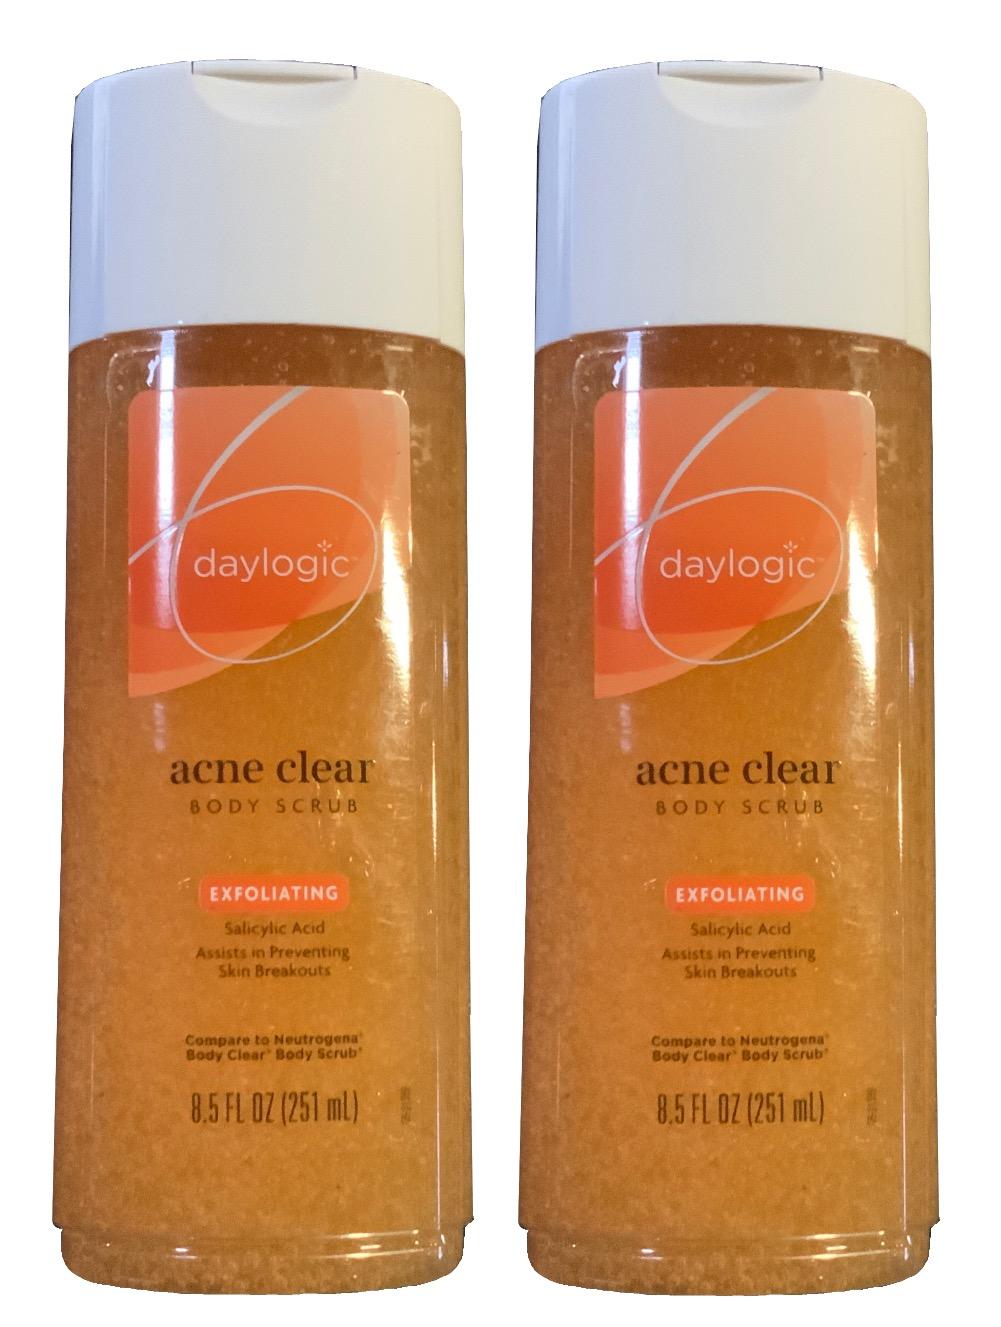 Daylogic 2 Pack Acne Clear Exfoliating Body Scrub Salicylic Acid